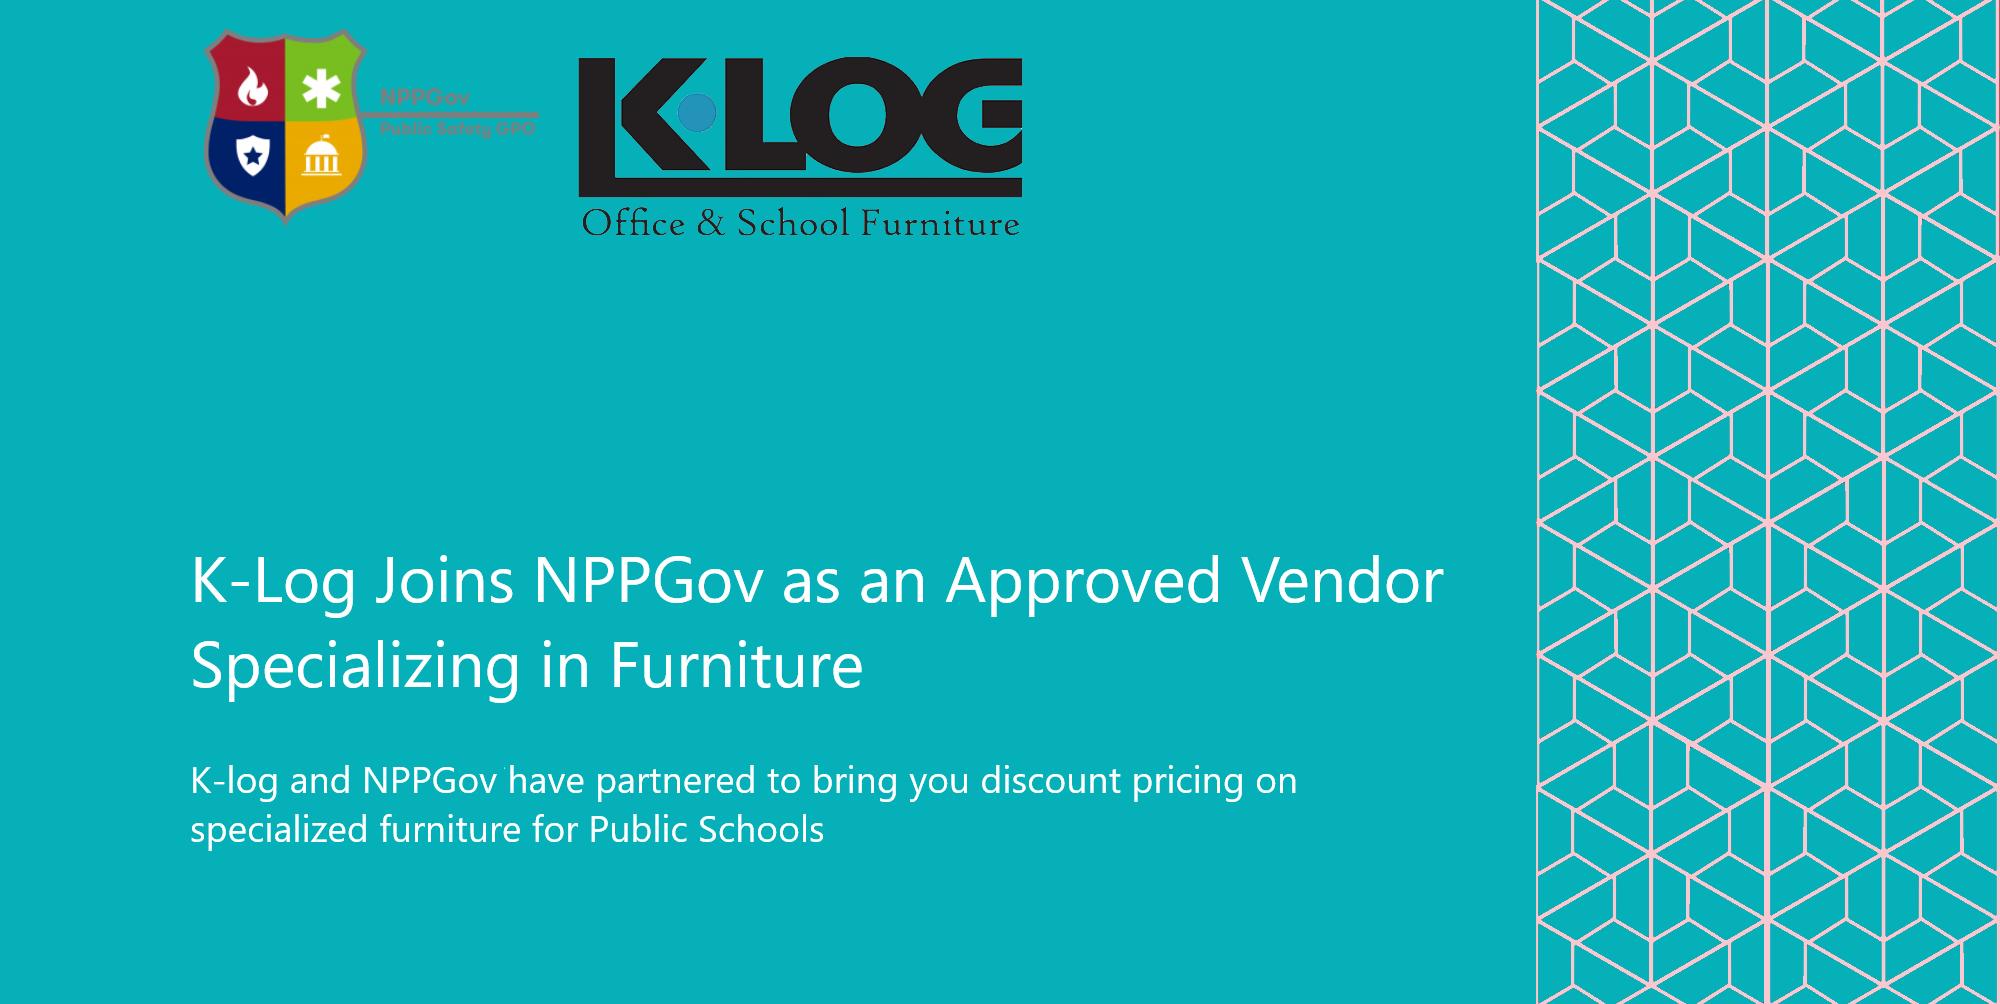 K-Log Joins NPPGov as an Approved Vendor Specializing in Furniture